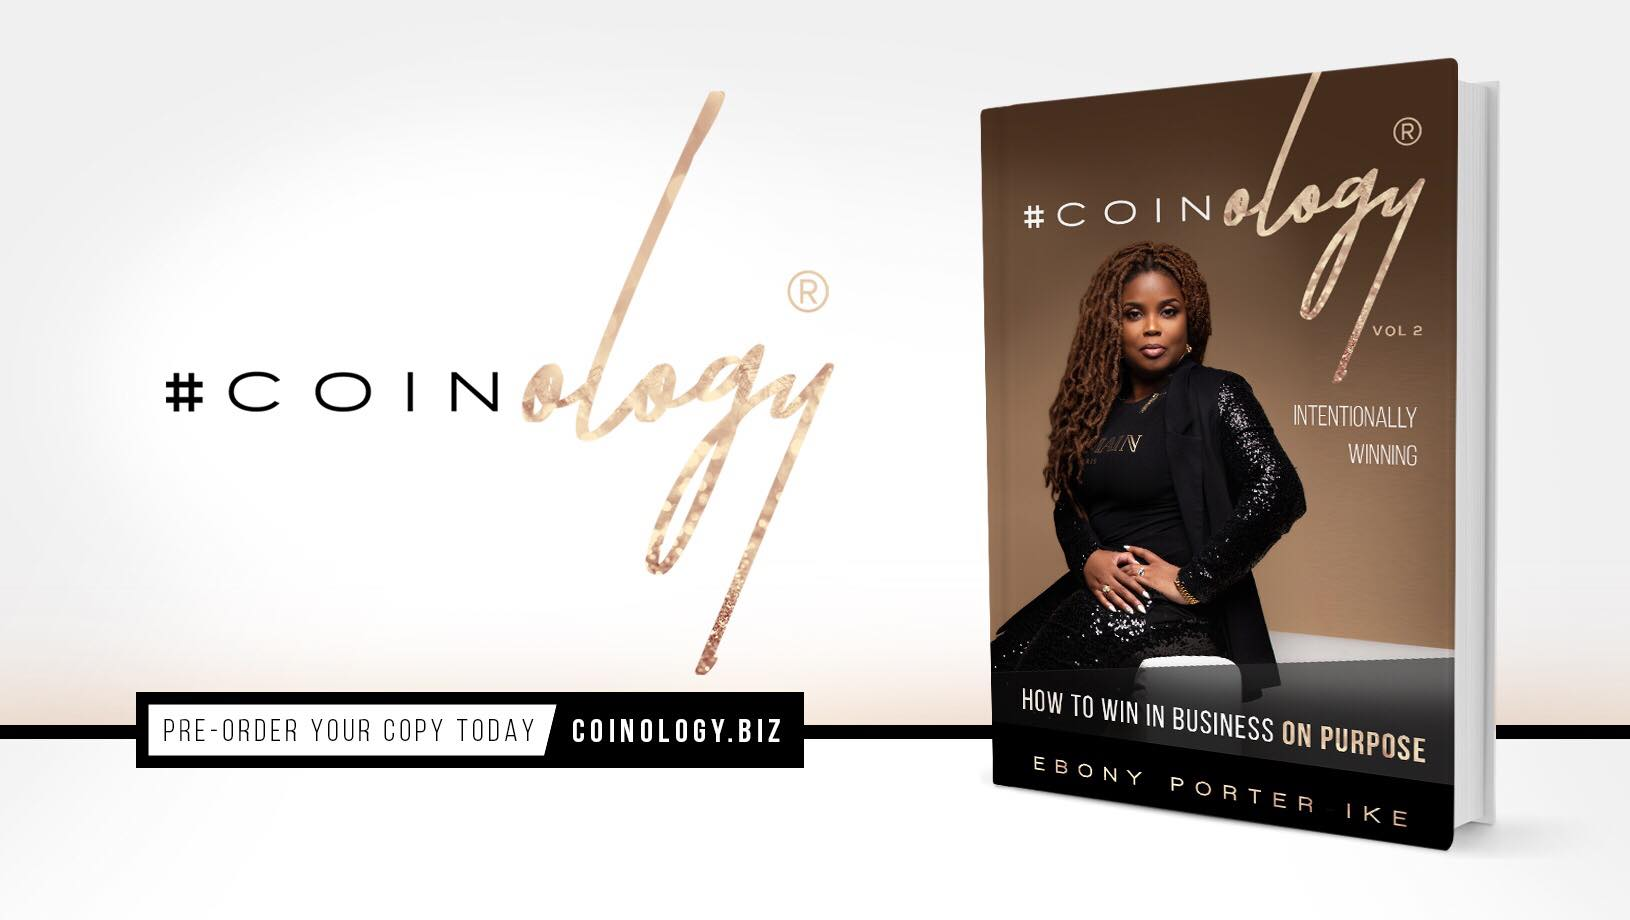 Coinology Vol 2 - Intentionally Winning